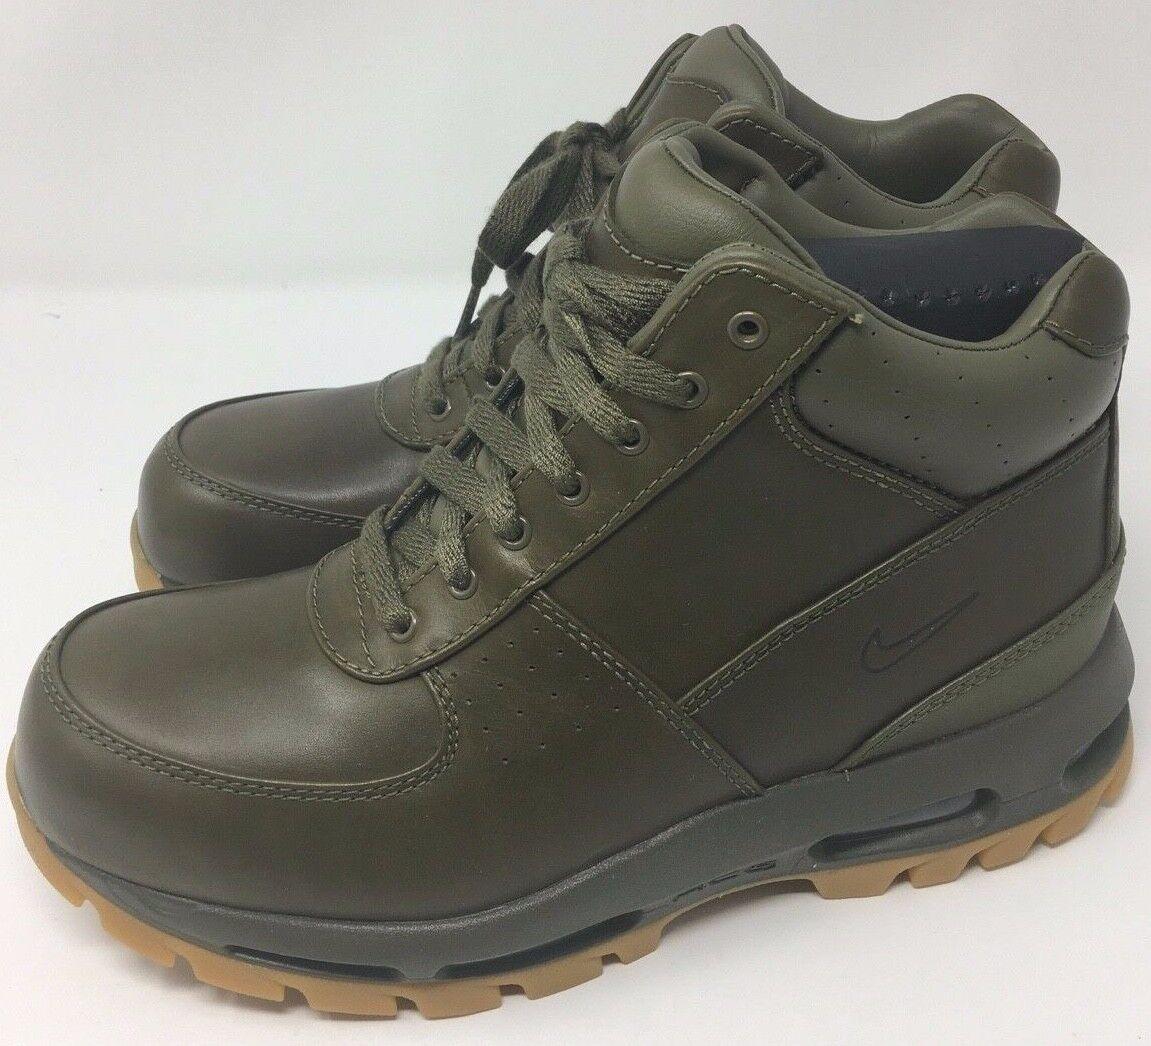 New Nike Air Max Goadome Men's Boot  Olive 865031-209 Size 8